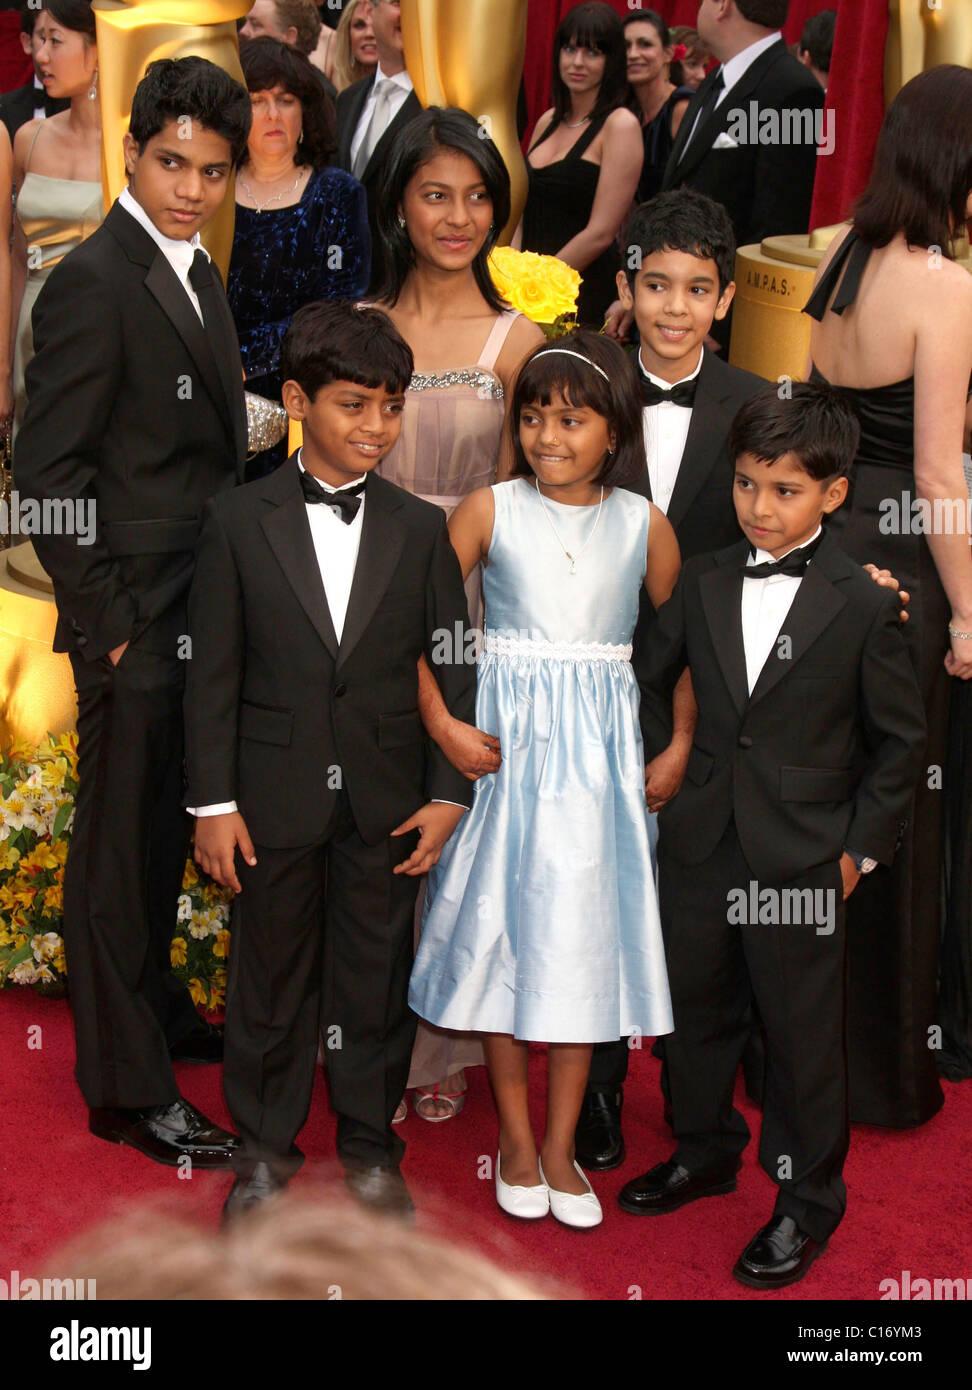 Cast of Slumdog Millionaire child actors Tanvi Ganesh (C, back row), Mohammed Azharuddin Ismail (L front), Rubina Ali Qweshi Stock Photo